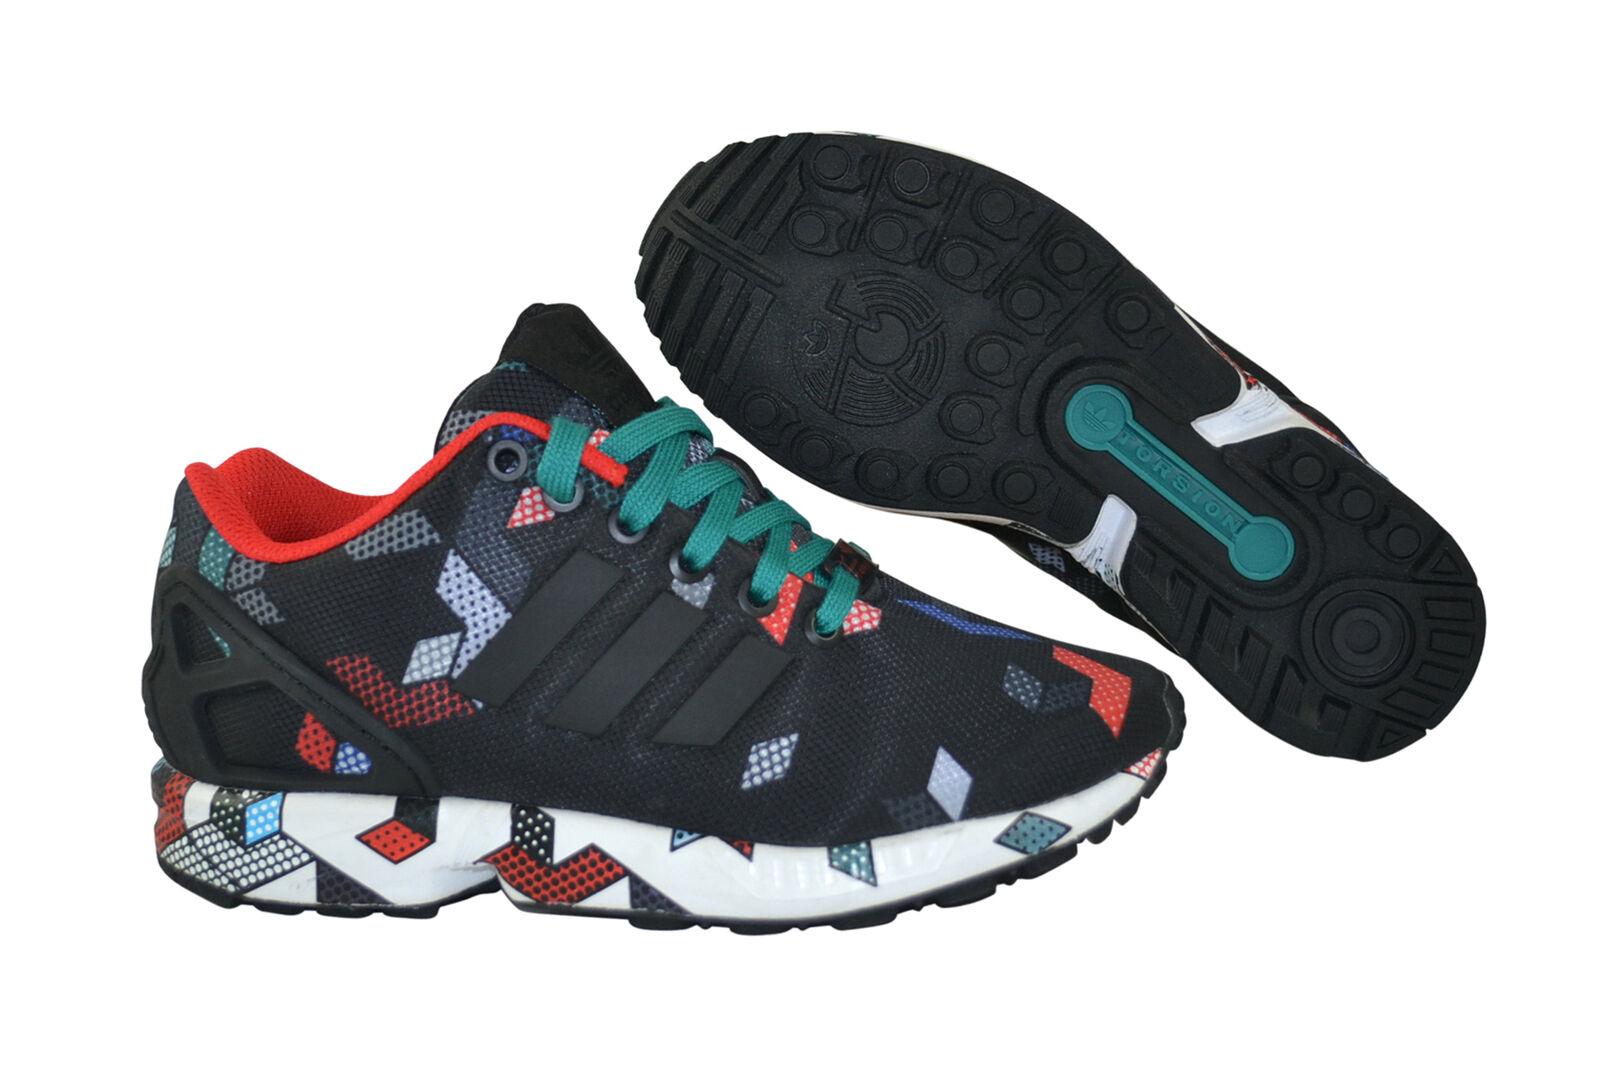 Adidas ZX Flux core black eqt green Sneaker Schuhe schwarz S79095